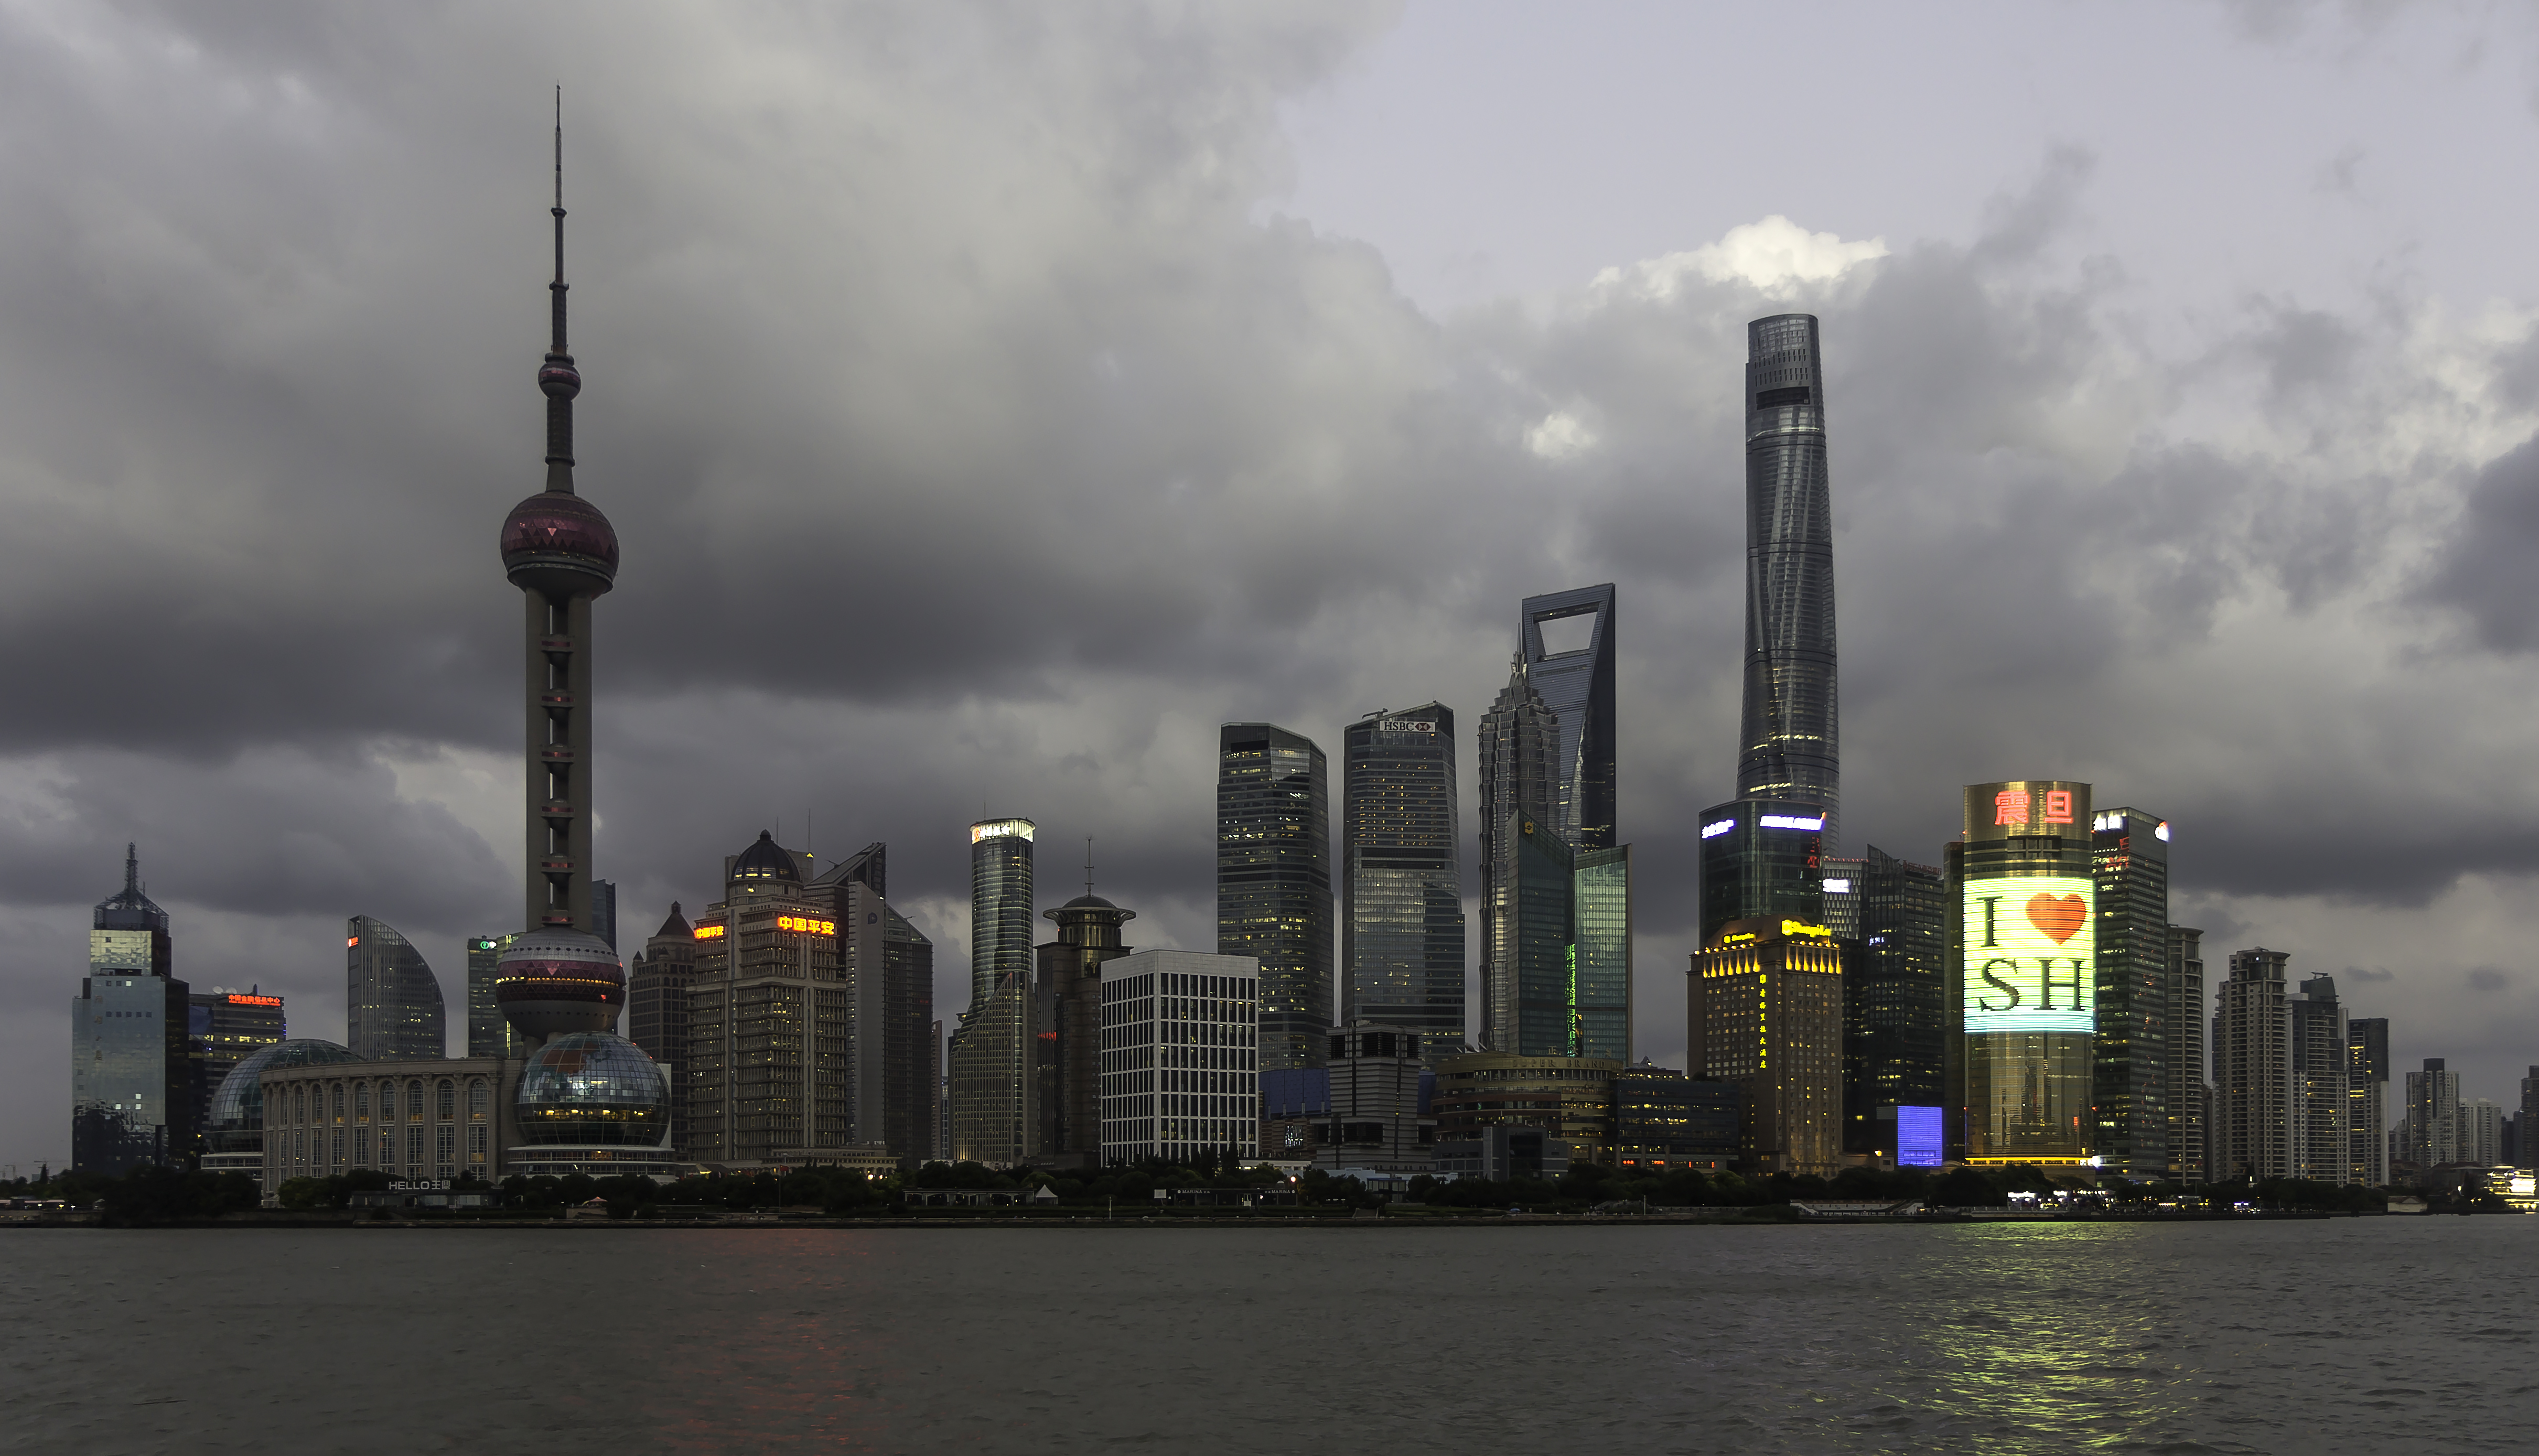 File:Shanghai - Skyline Sunset 0011.jpg